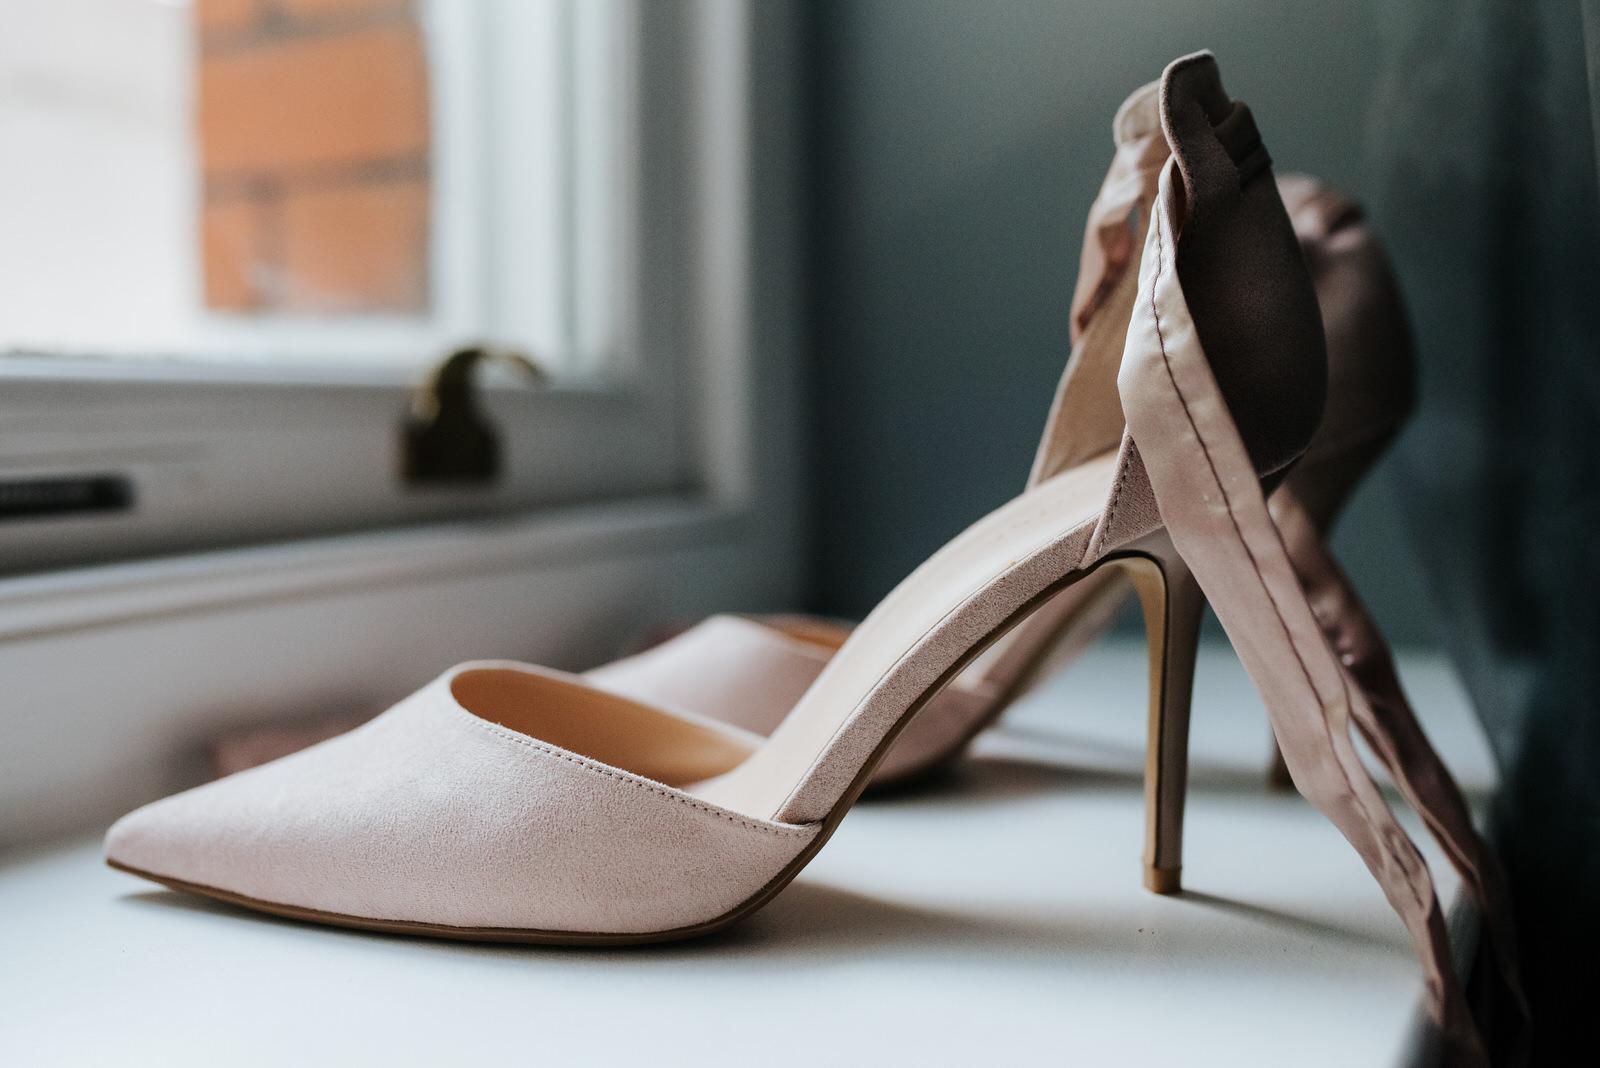 Baby pink bridal shoes detail shot